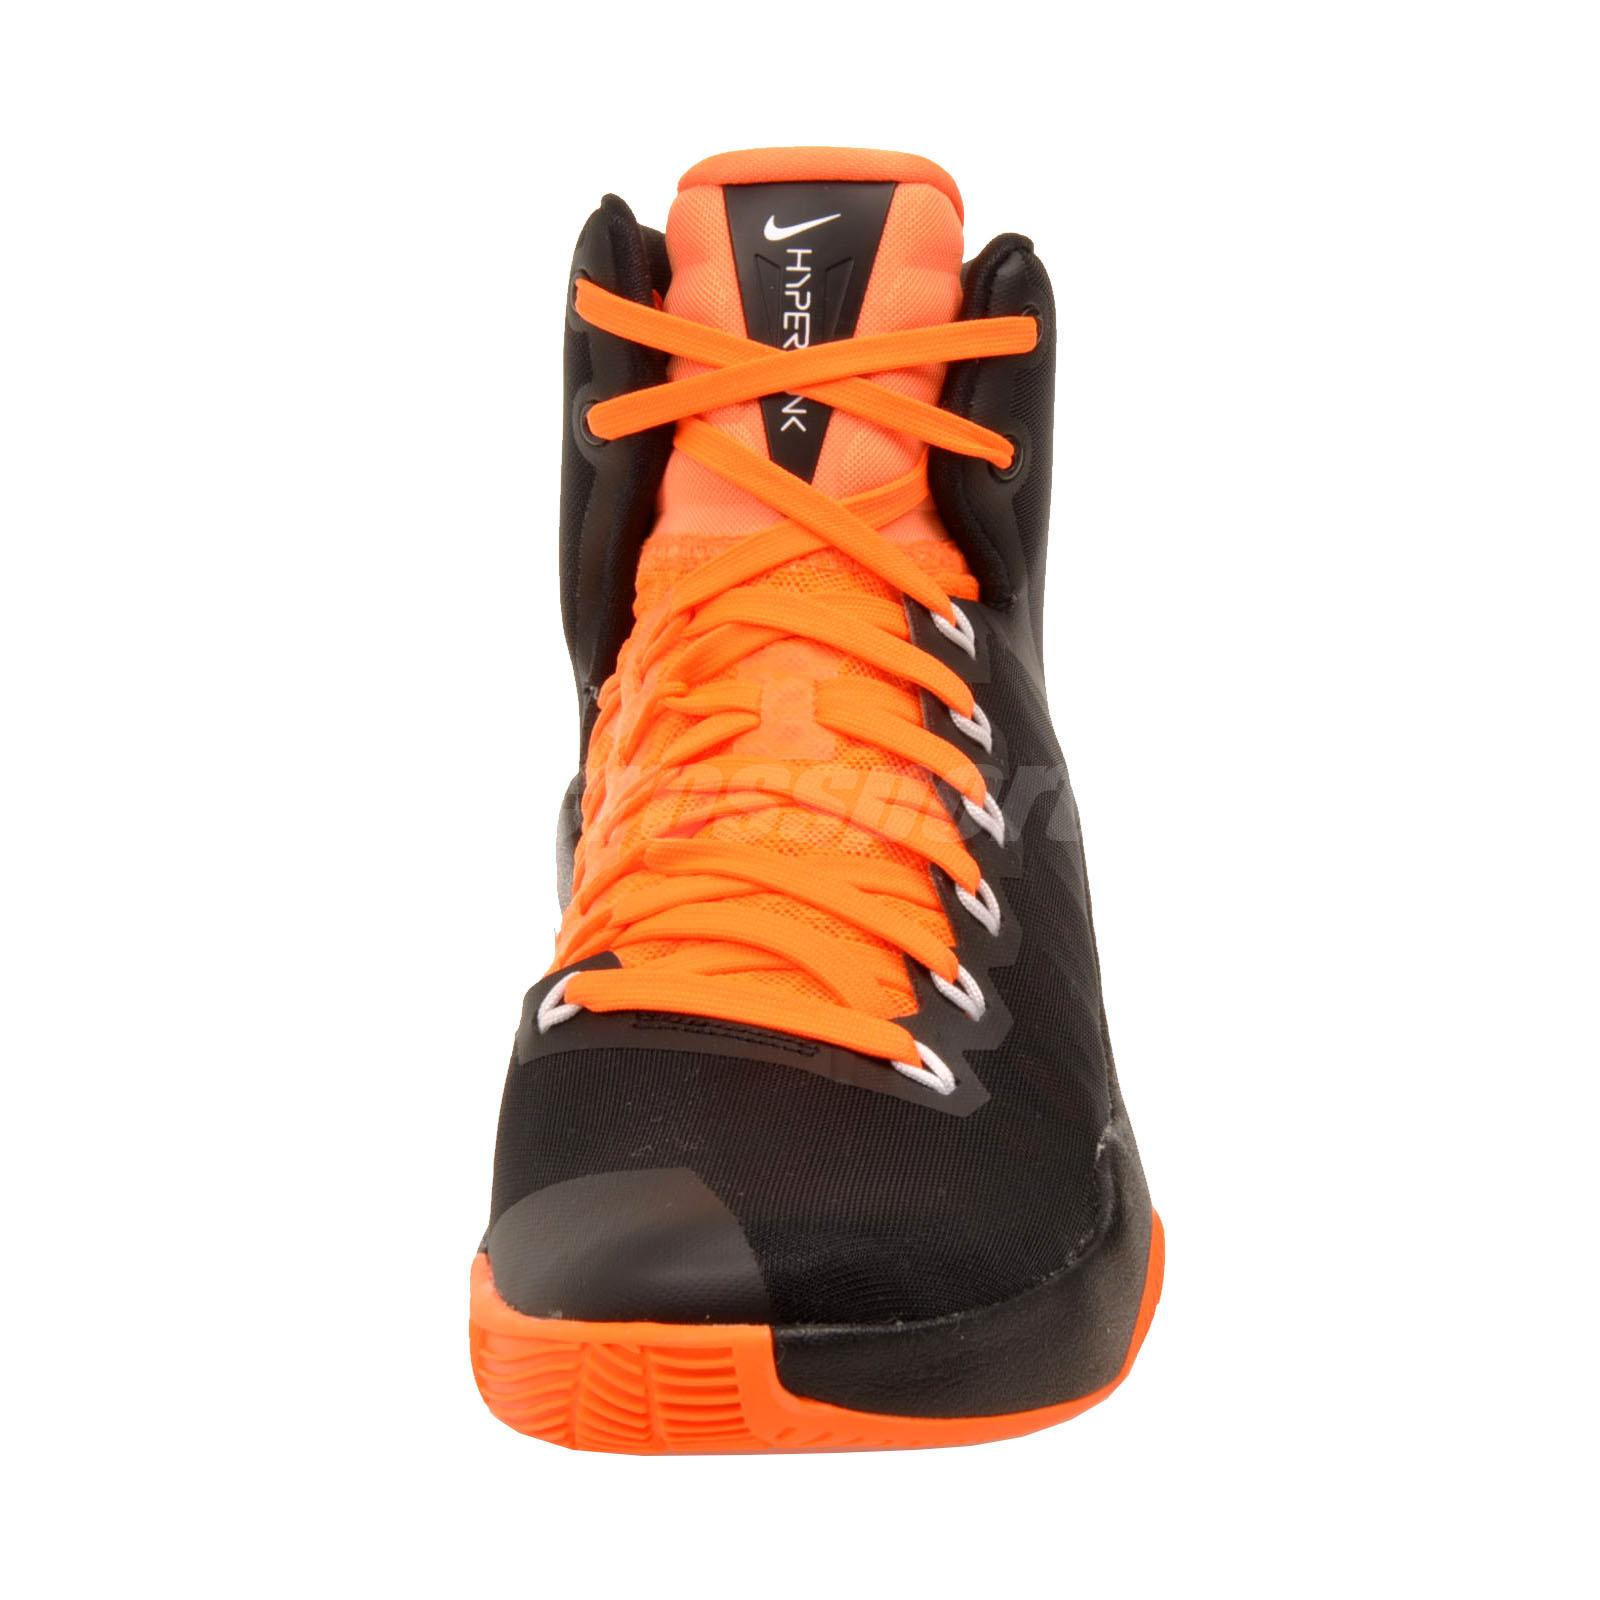 free shipping dfdcf e17a6 ... australia nike hyperdunk 2016 se basketball mens shoes black orange  844362 c546f 62a41